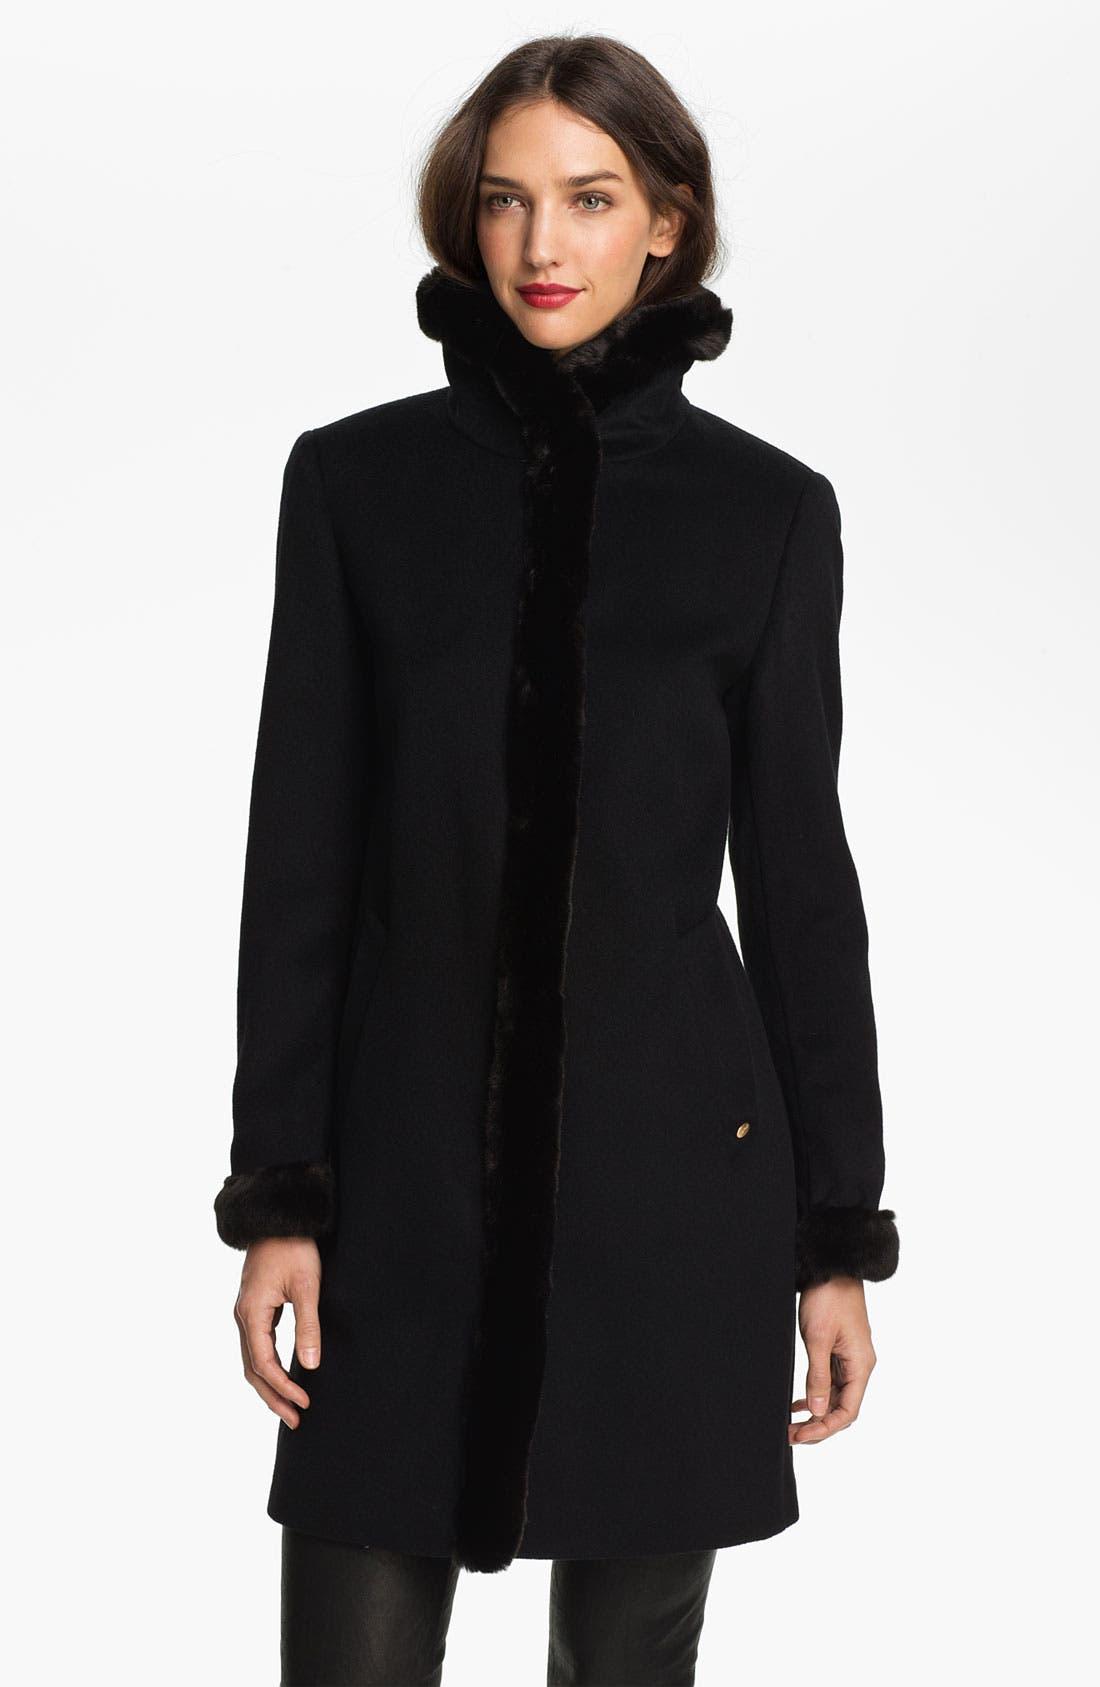 Alternate Image 1 Selected - Ellen Tracy Faux Fur Trim Walking Coat